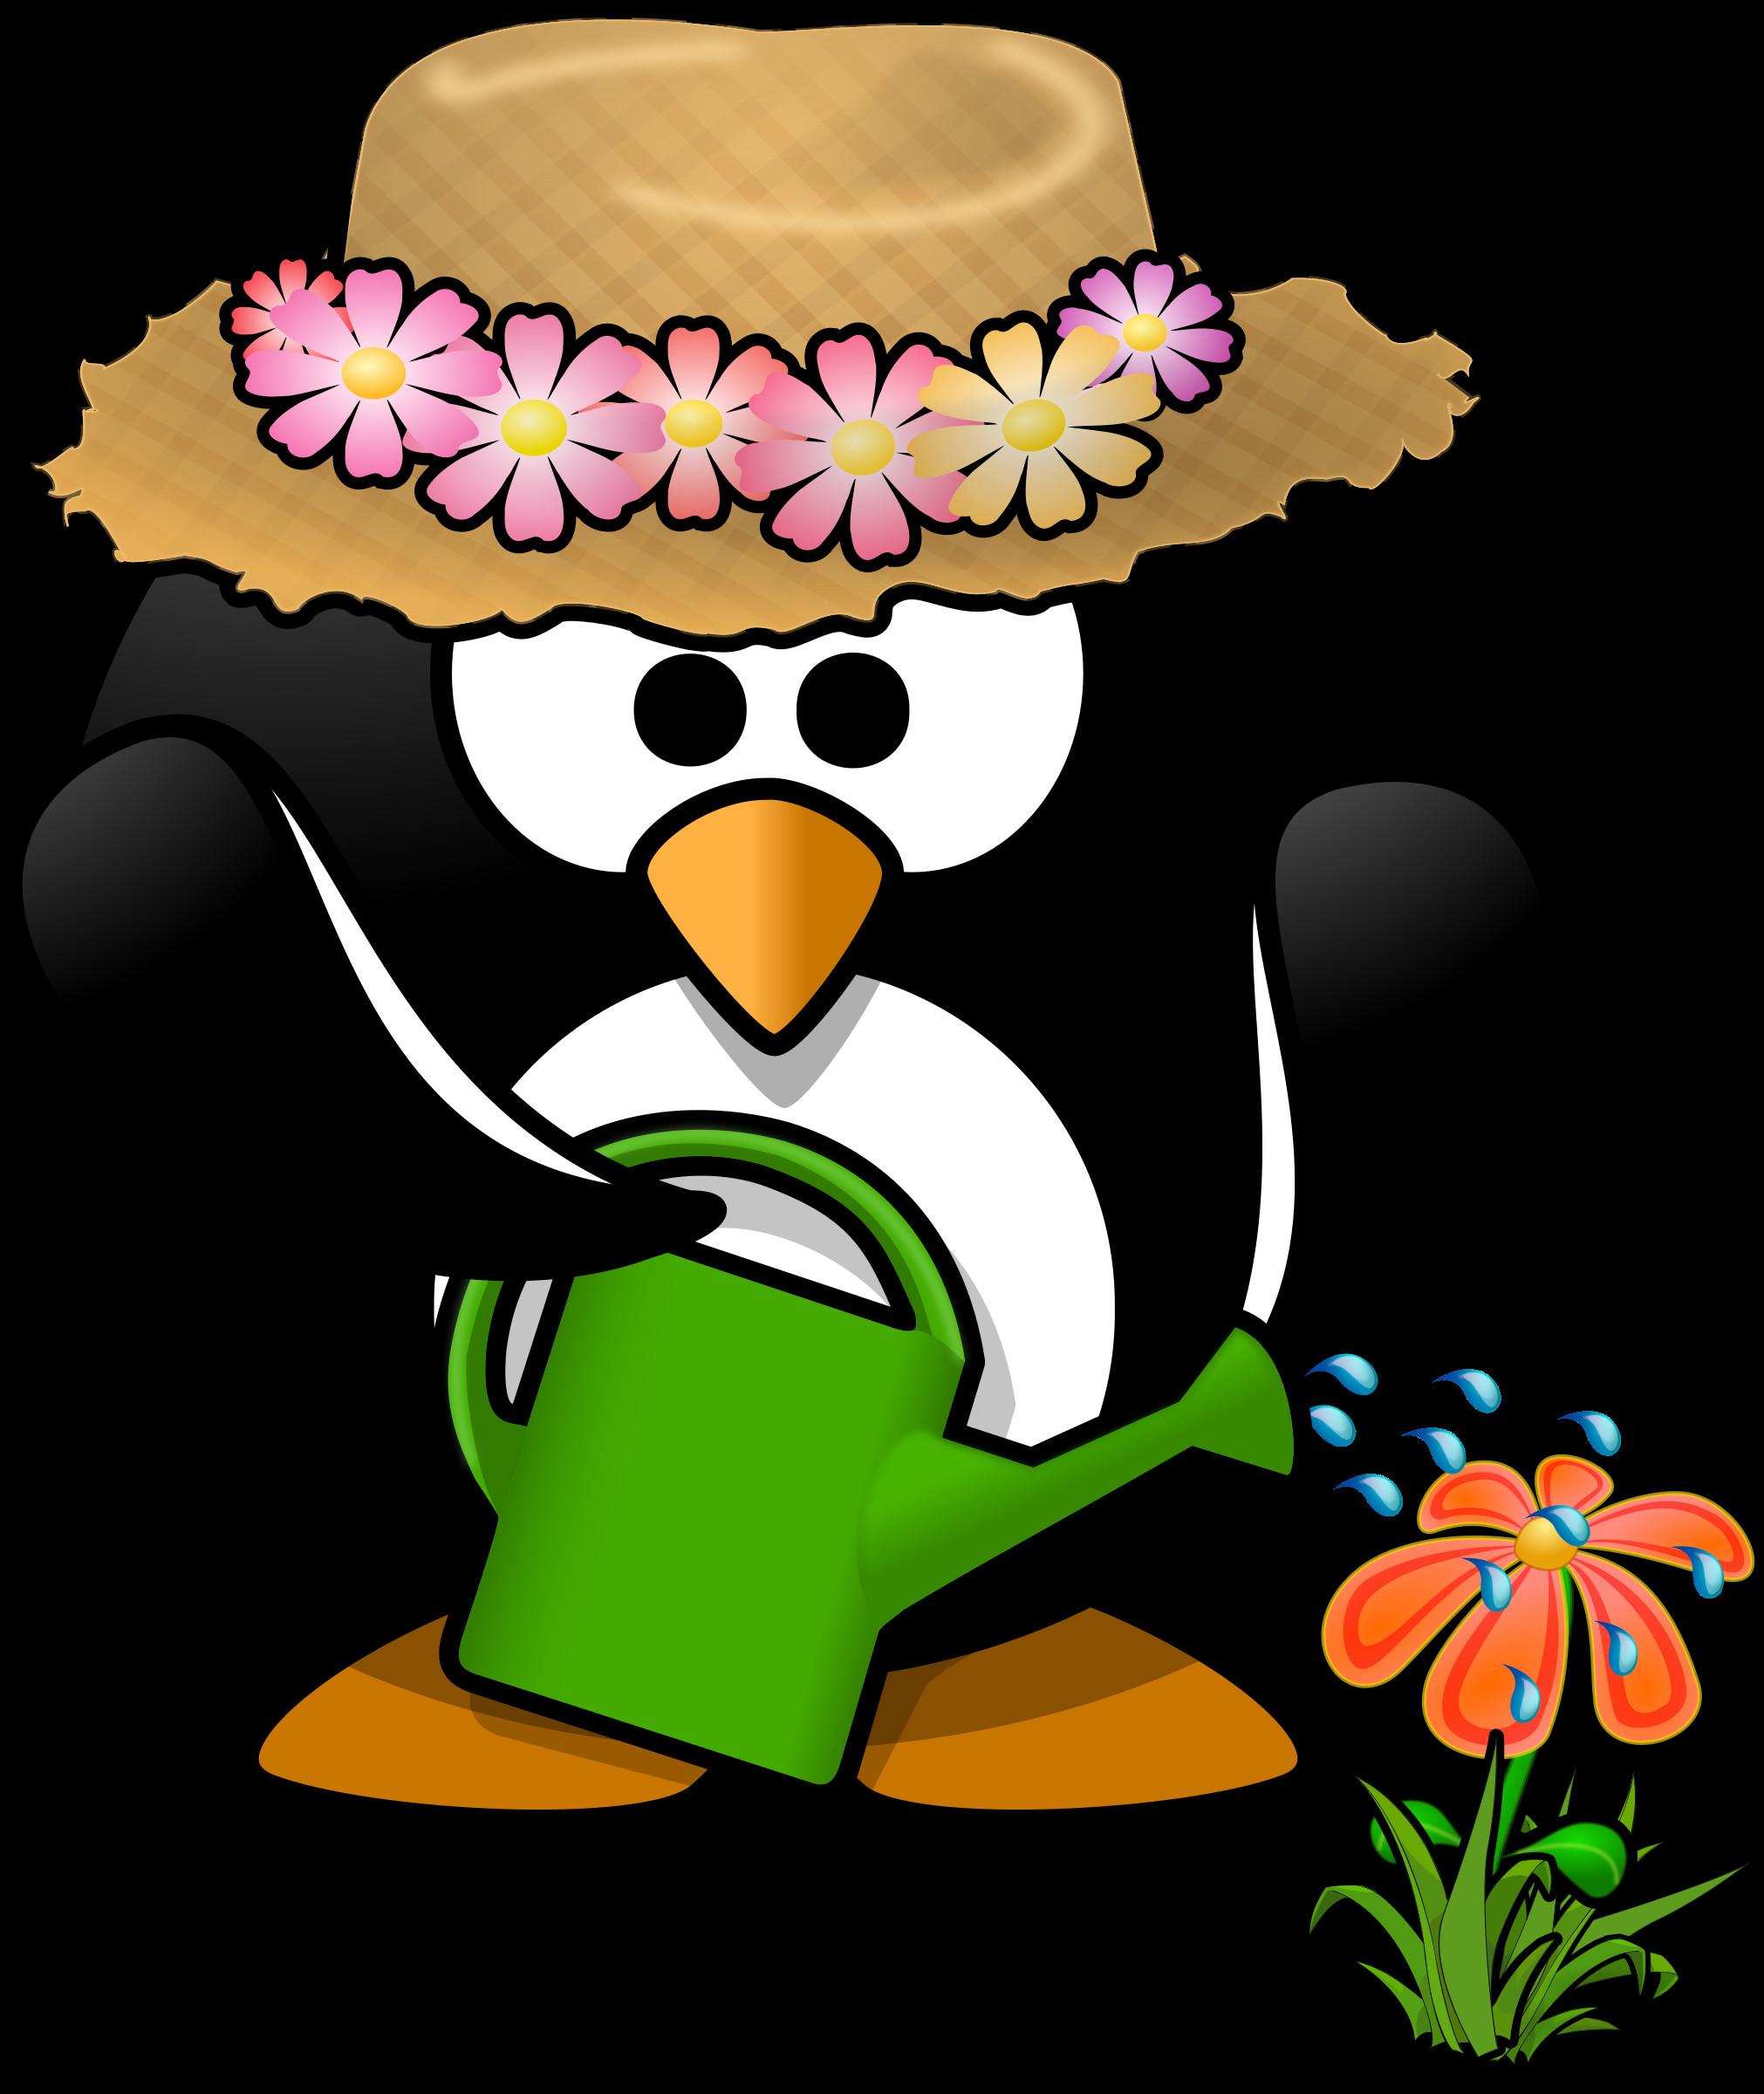 Microsoft clip art gardening clipart garden penguin toublanc info